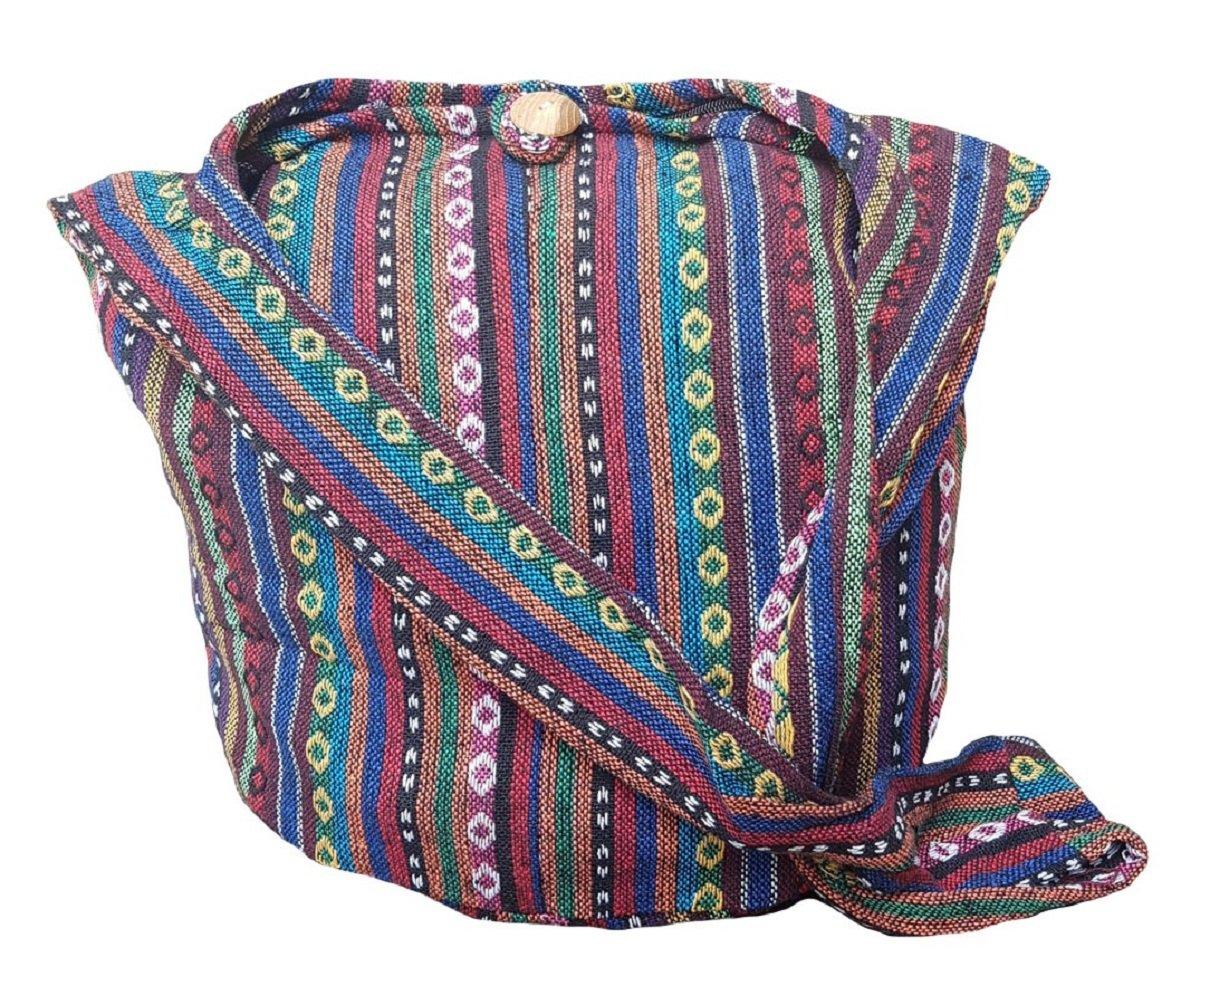 BTP! Thai Cotton Sling Bag Purse Crossbody Messenger Hippie Hobo Hand Woven Ikat (Multicolored A101)